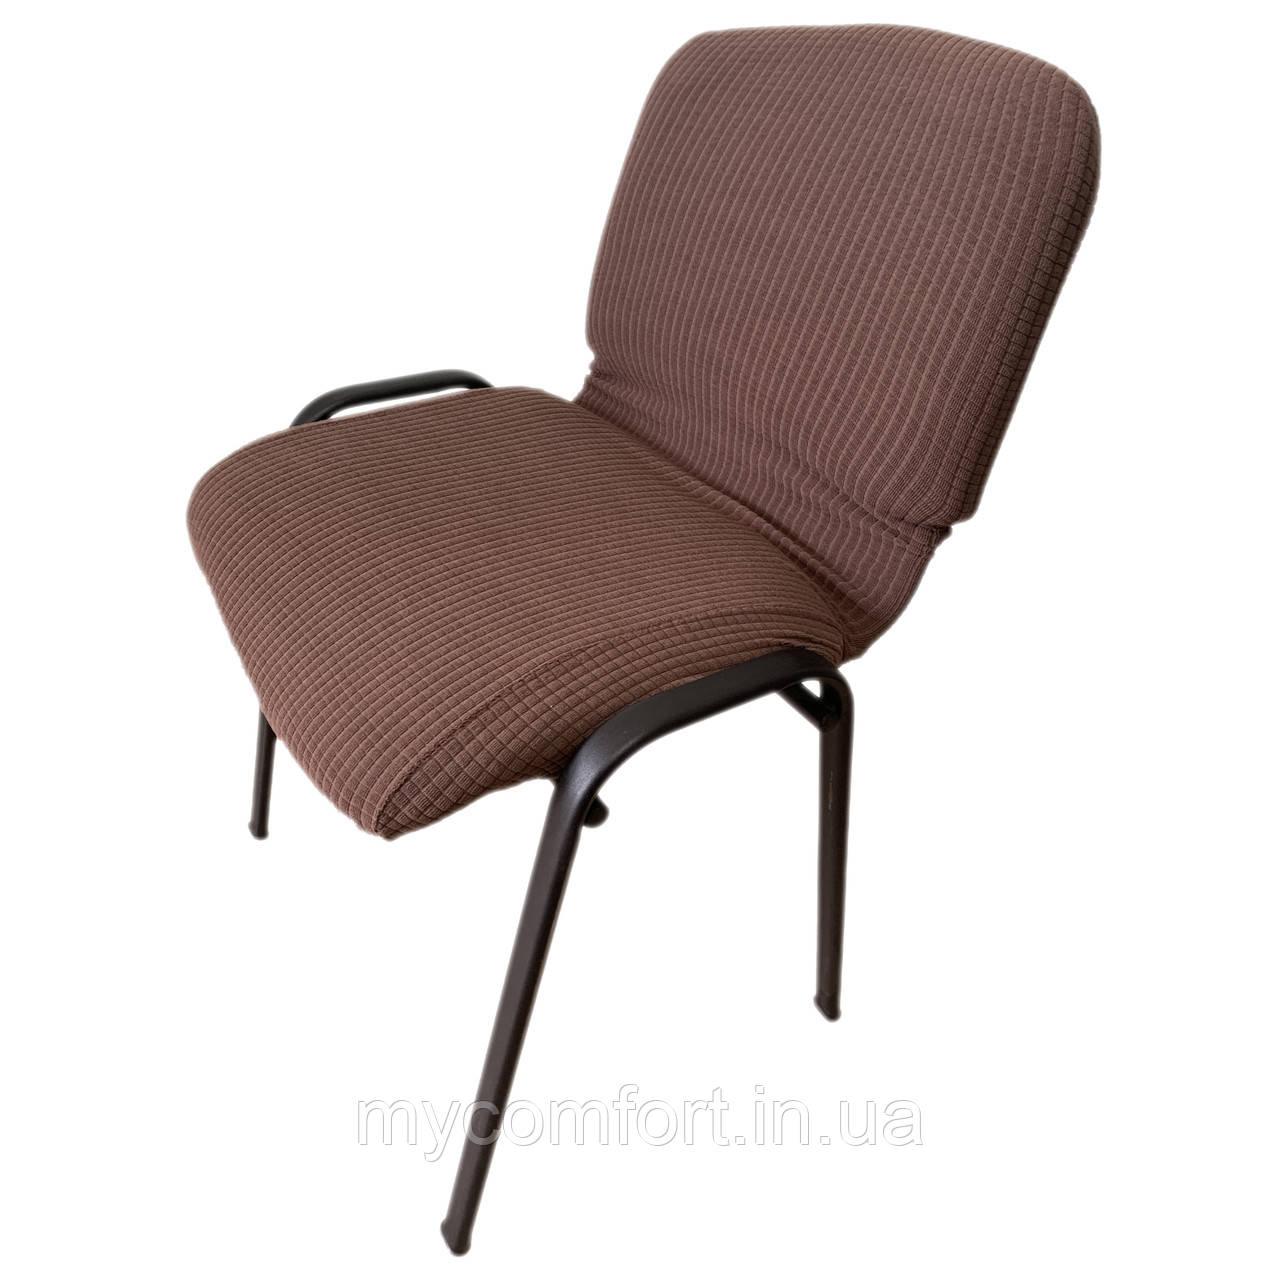 Чехол на офисный стул. Коричневый (KareOffice)